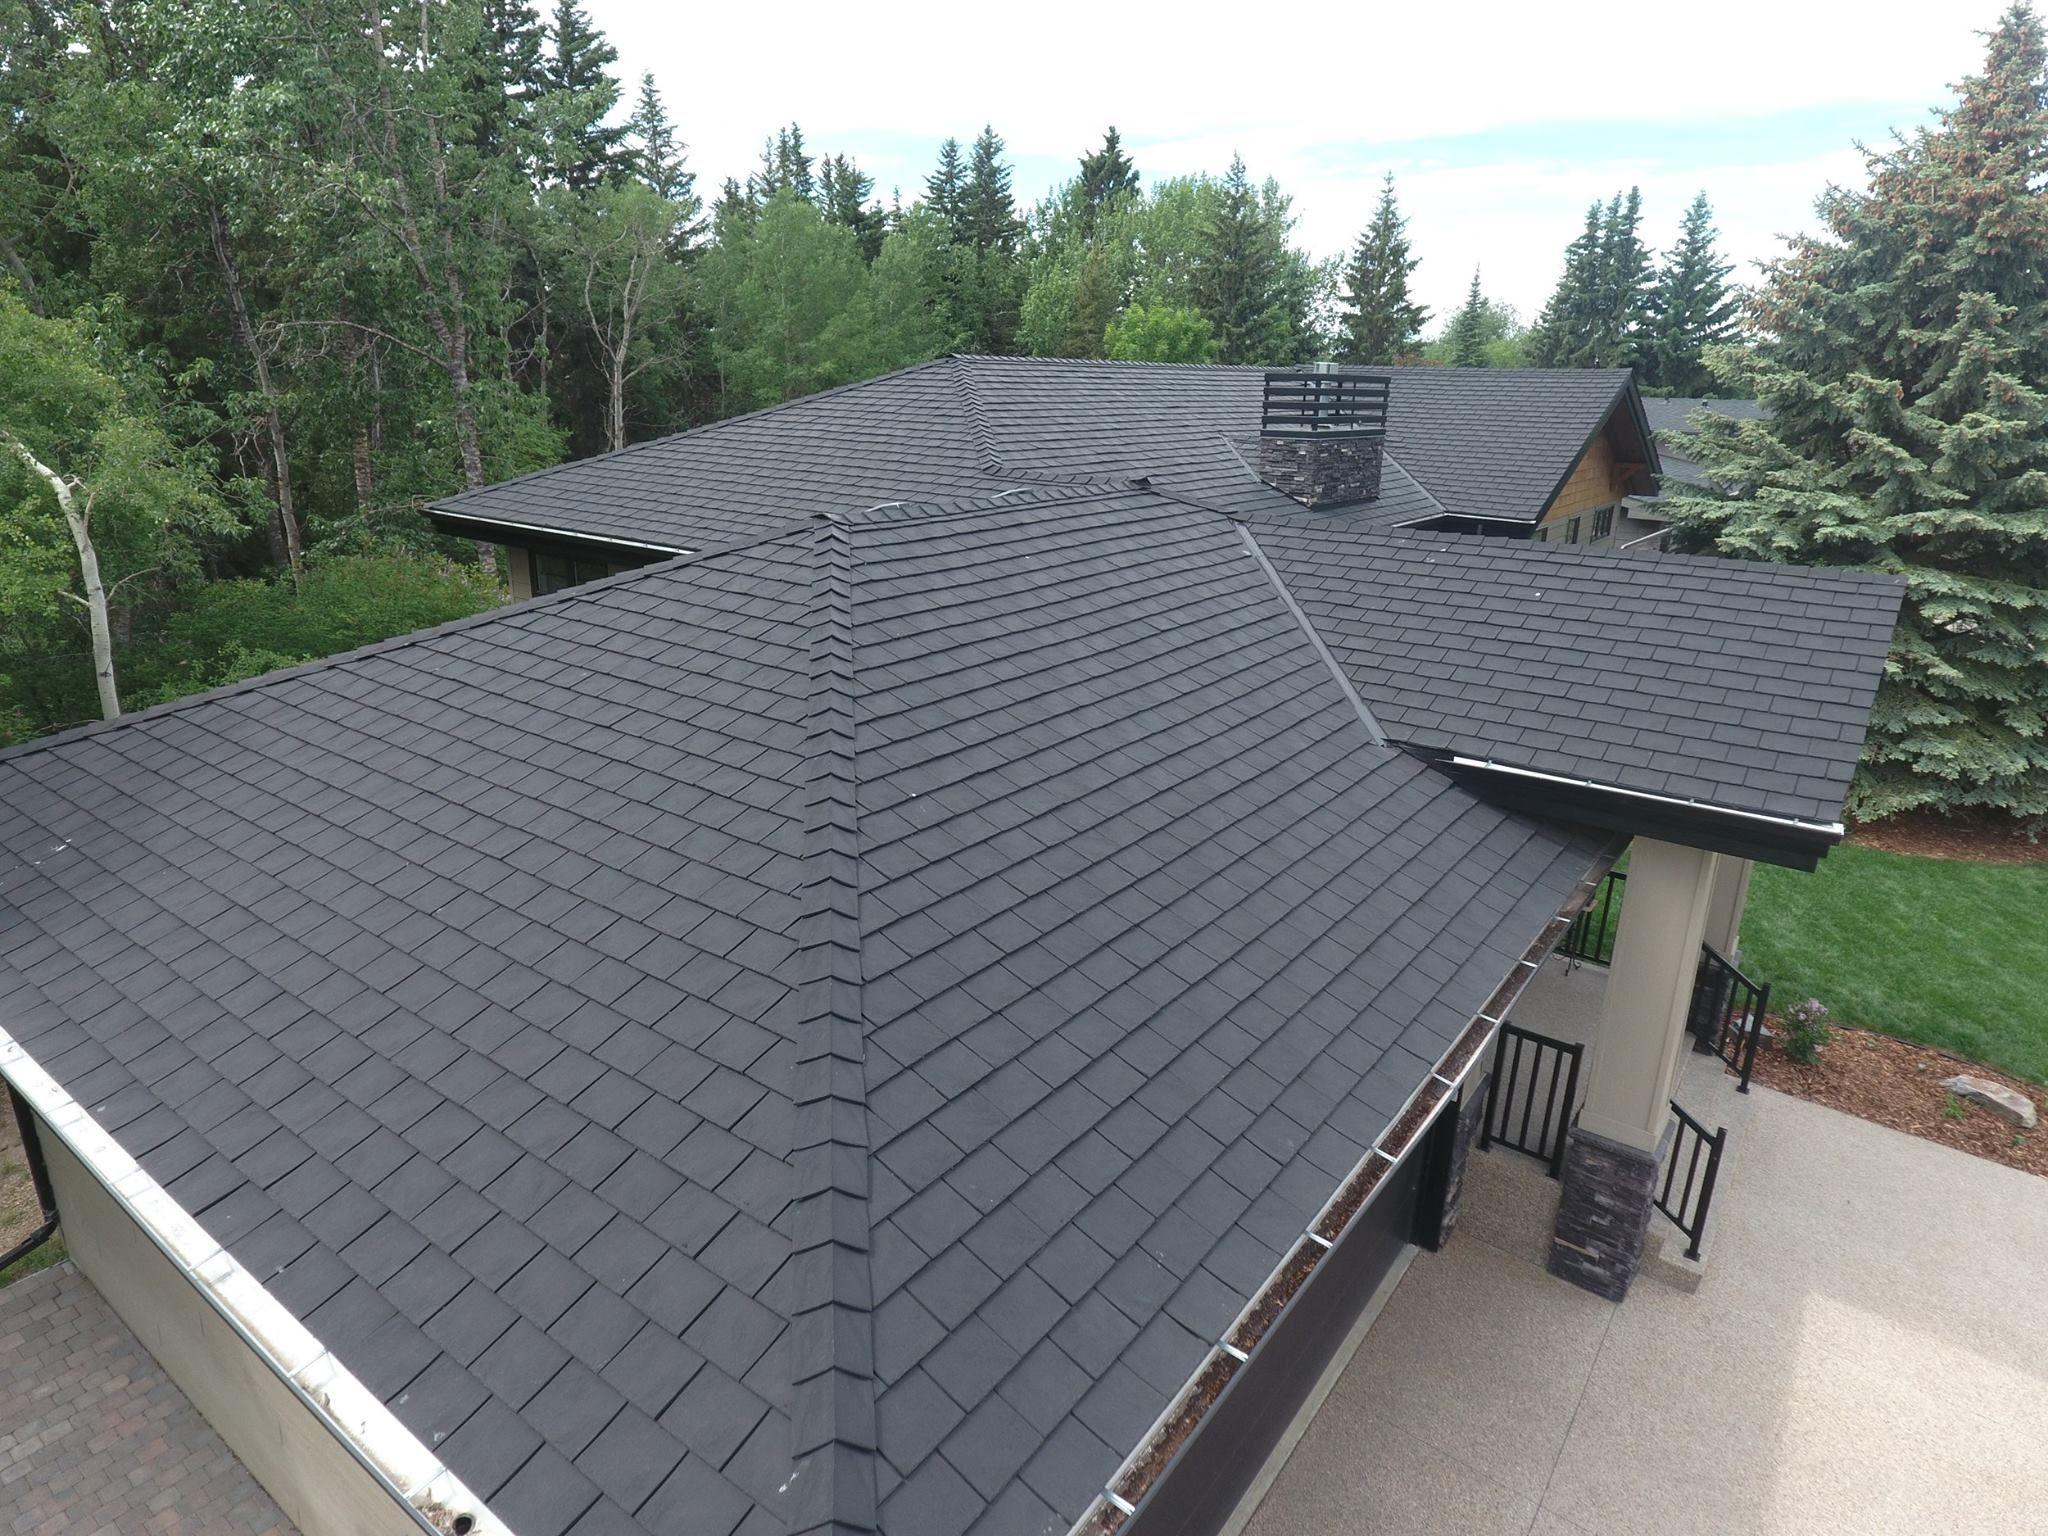 Heritage Slate In Black Slate Black Roof Authenticlook Rubber Roofingmaterial Lifetimewarranty Contractor Modern Roofing Fibreglass Roof Roof Design